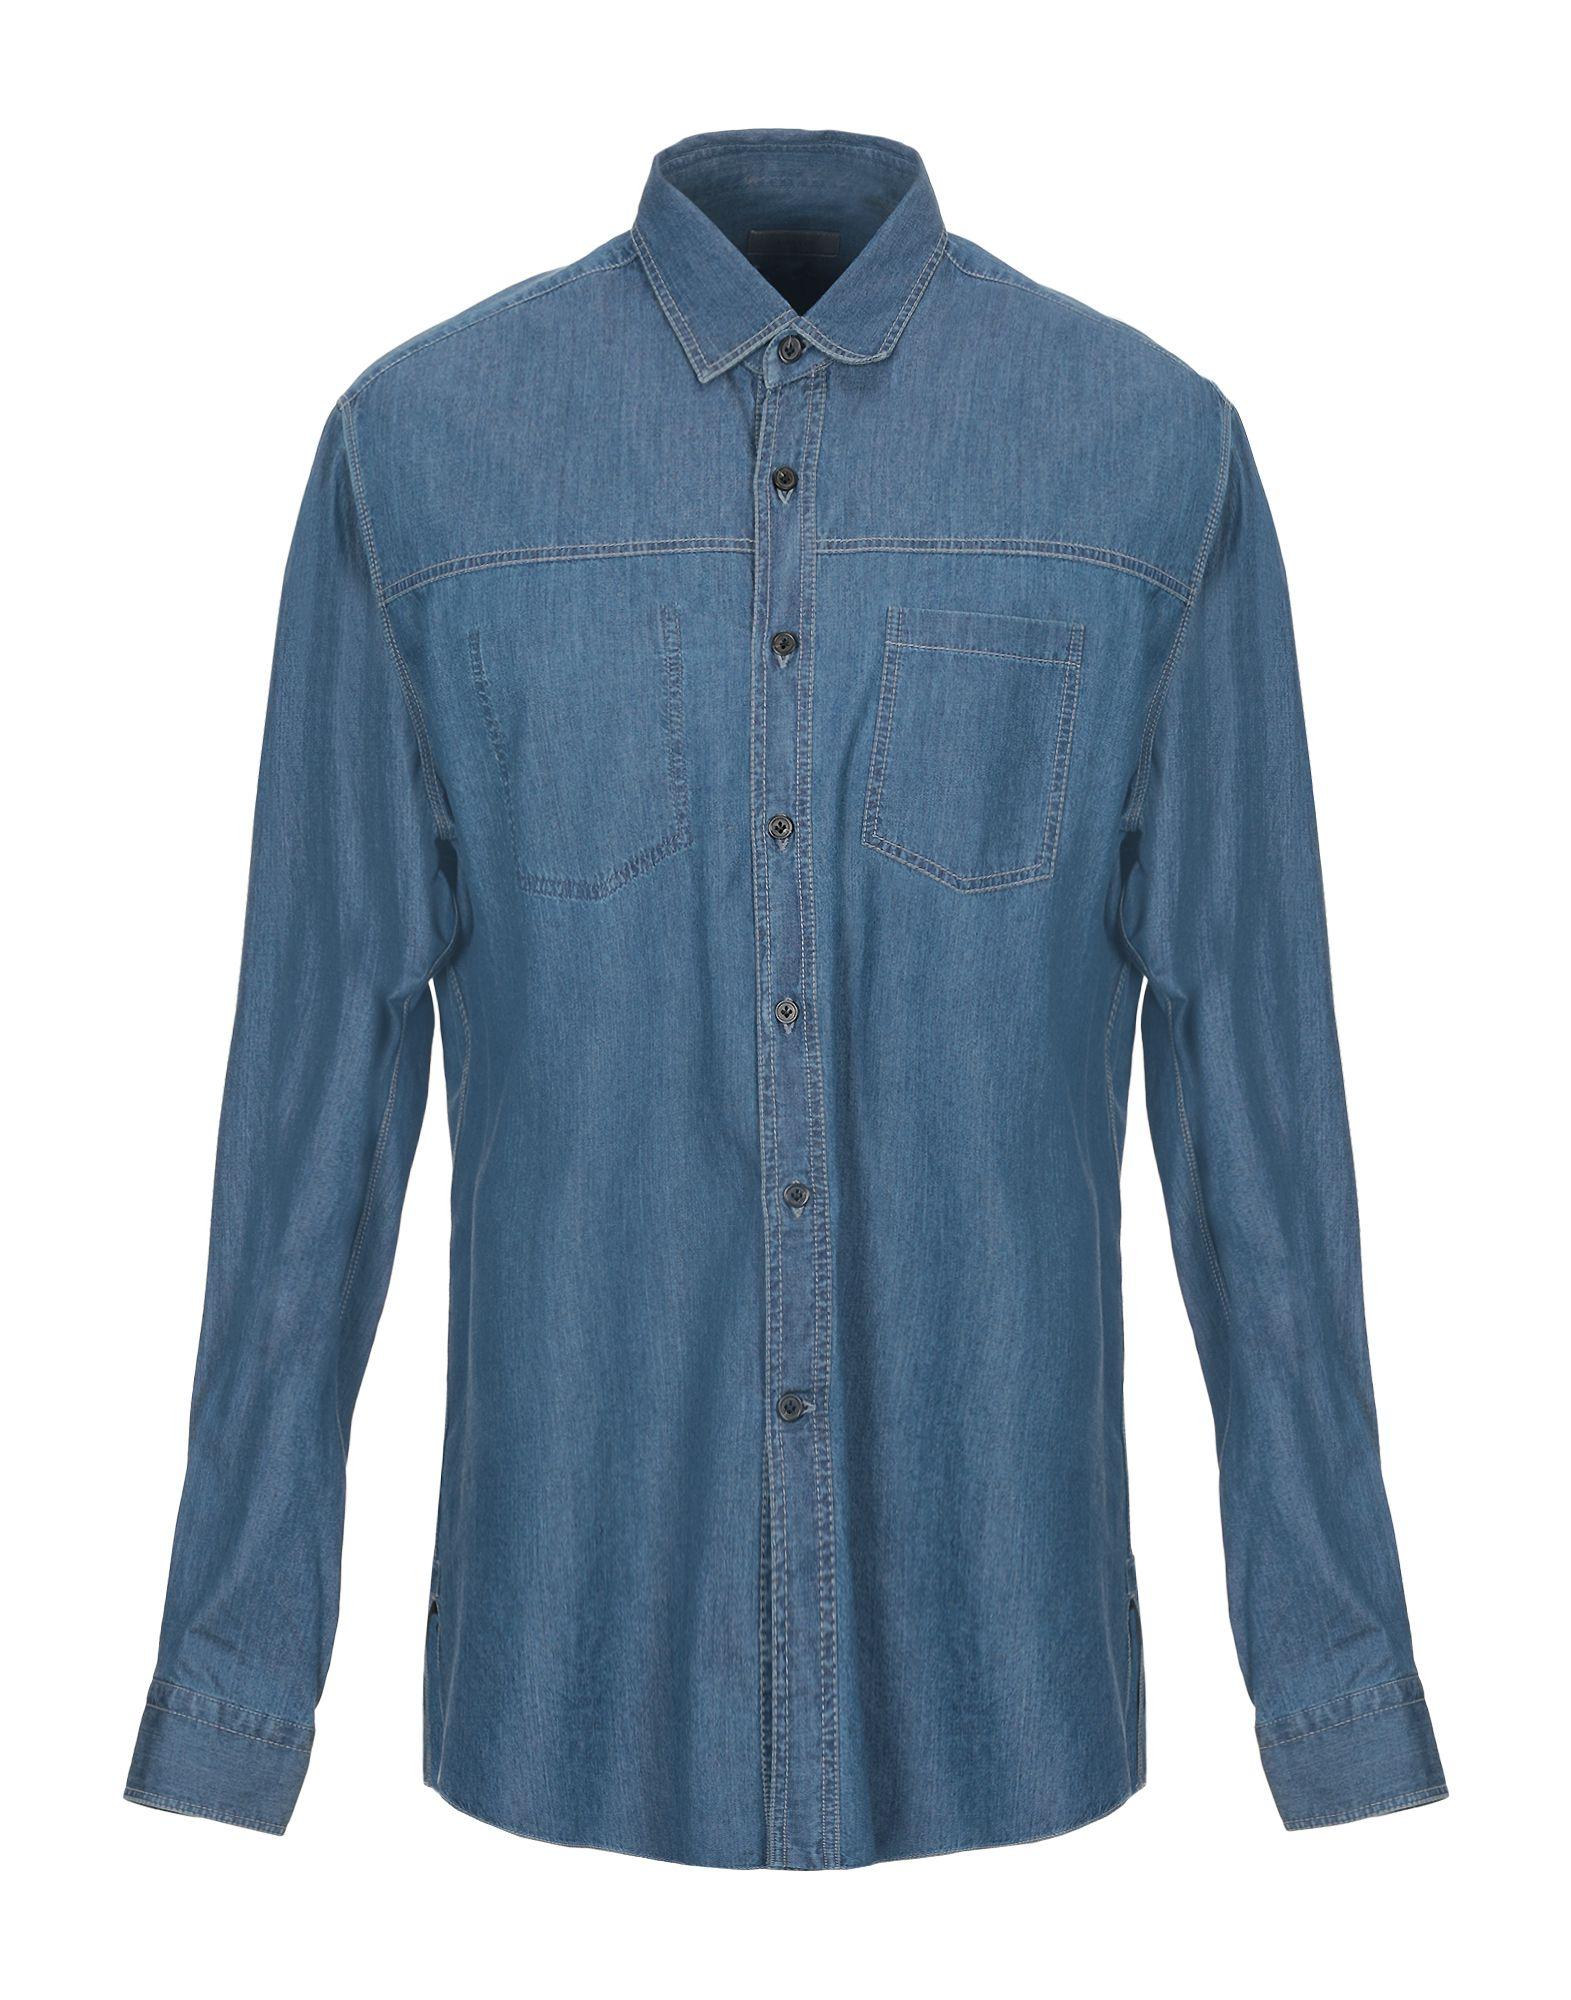 LANVIN Джинсовая рубашка